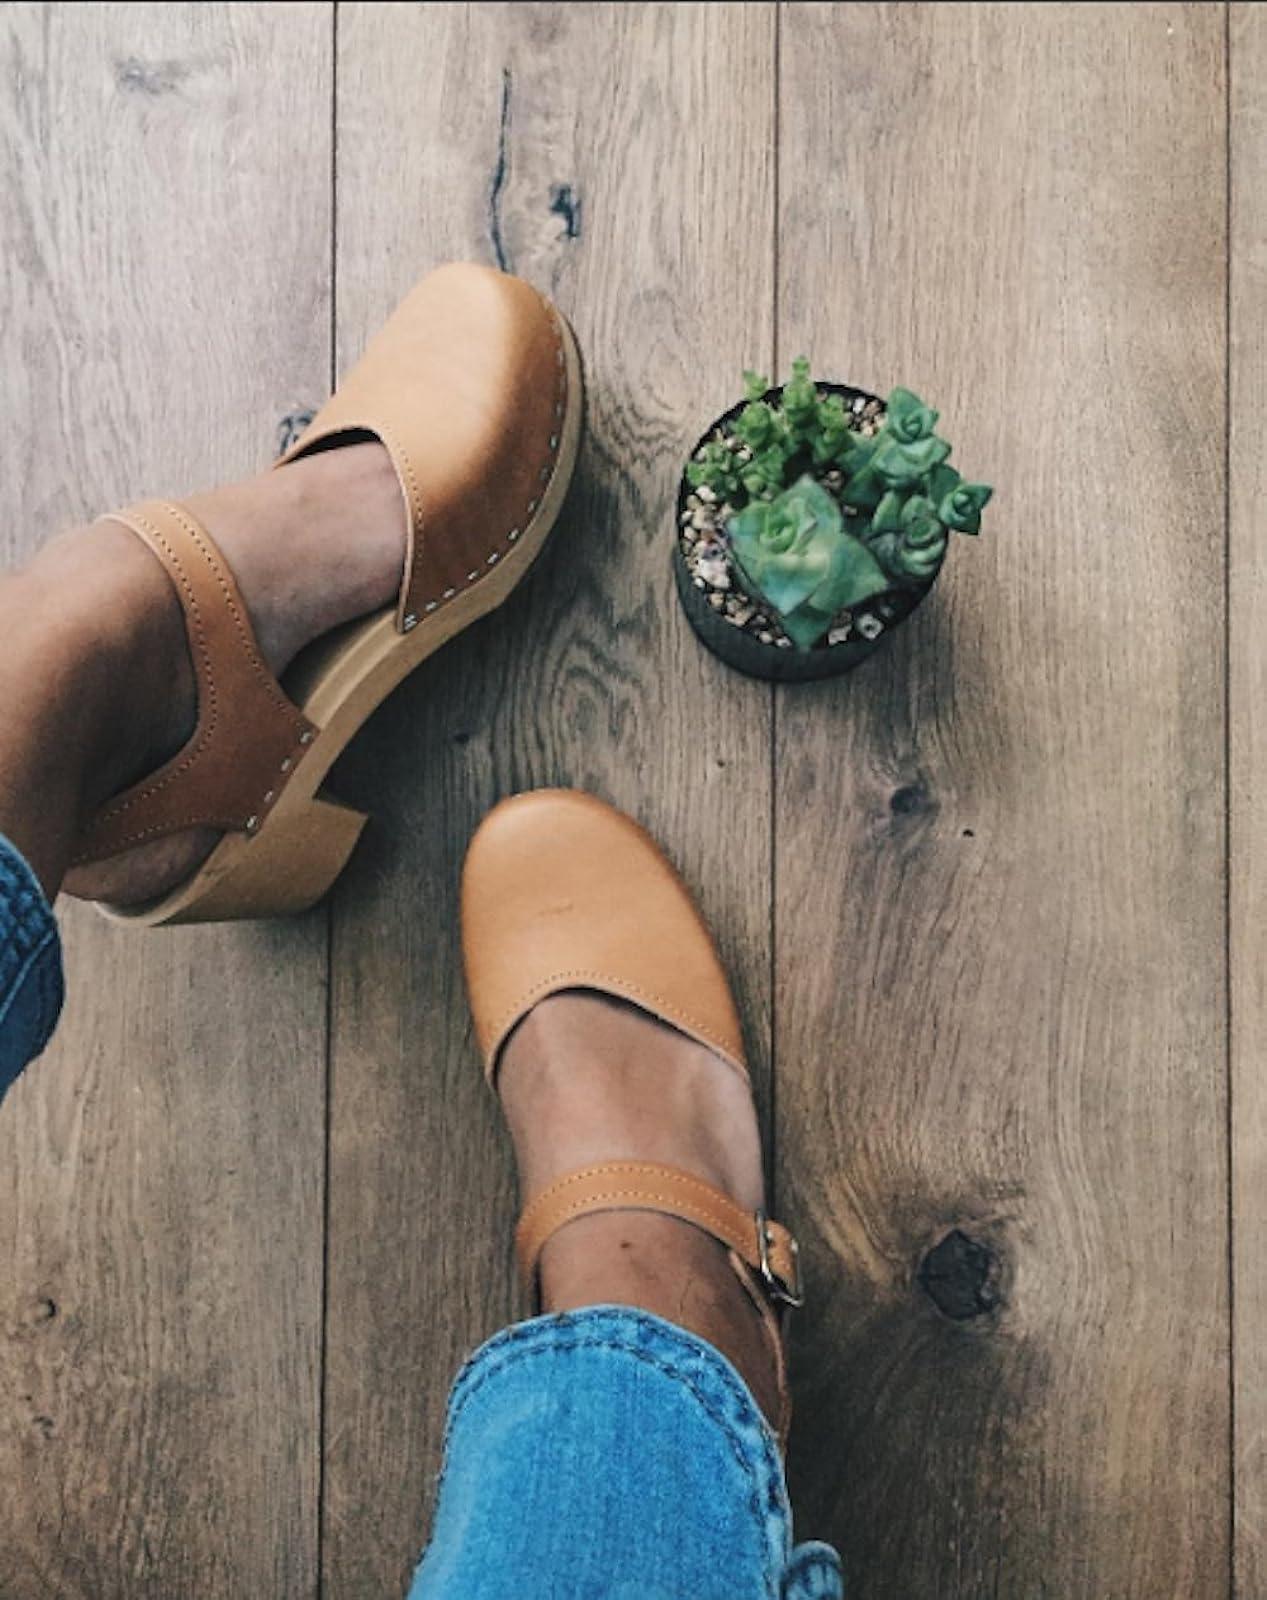 Sandgrens Swedish Wooden High Heel Clog Sandals - 5